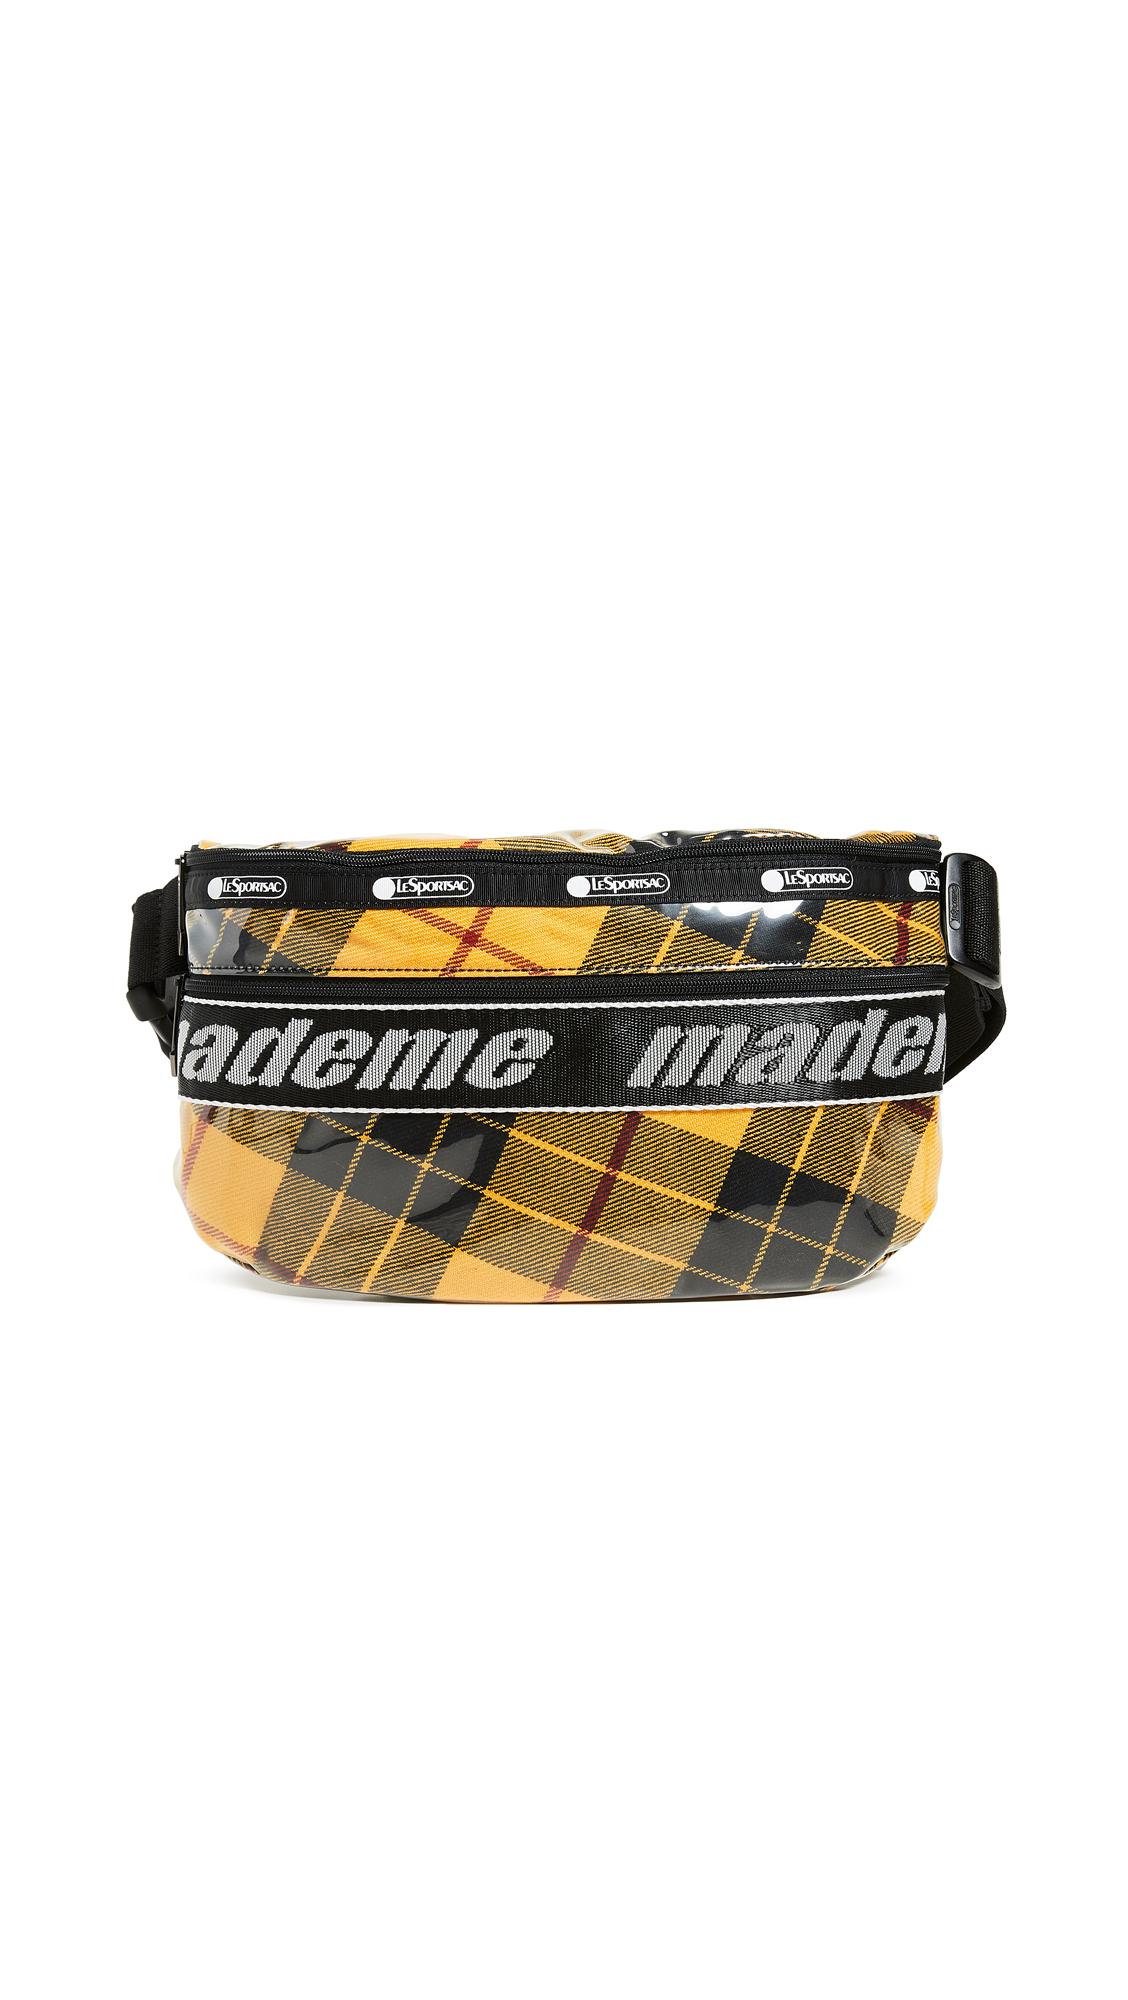 LESPORTSAC X Mademe Belt Bag in Yellow Plaid